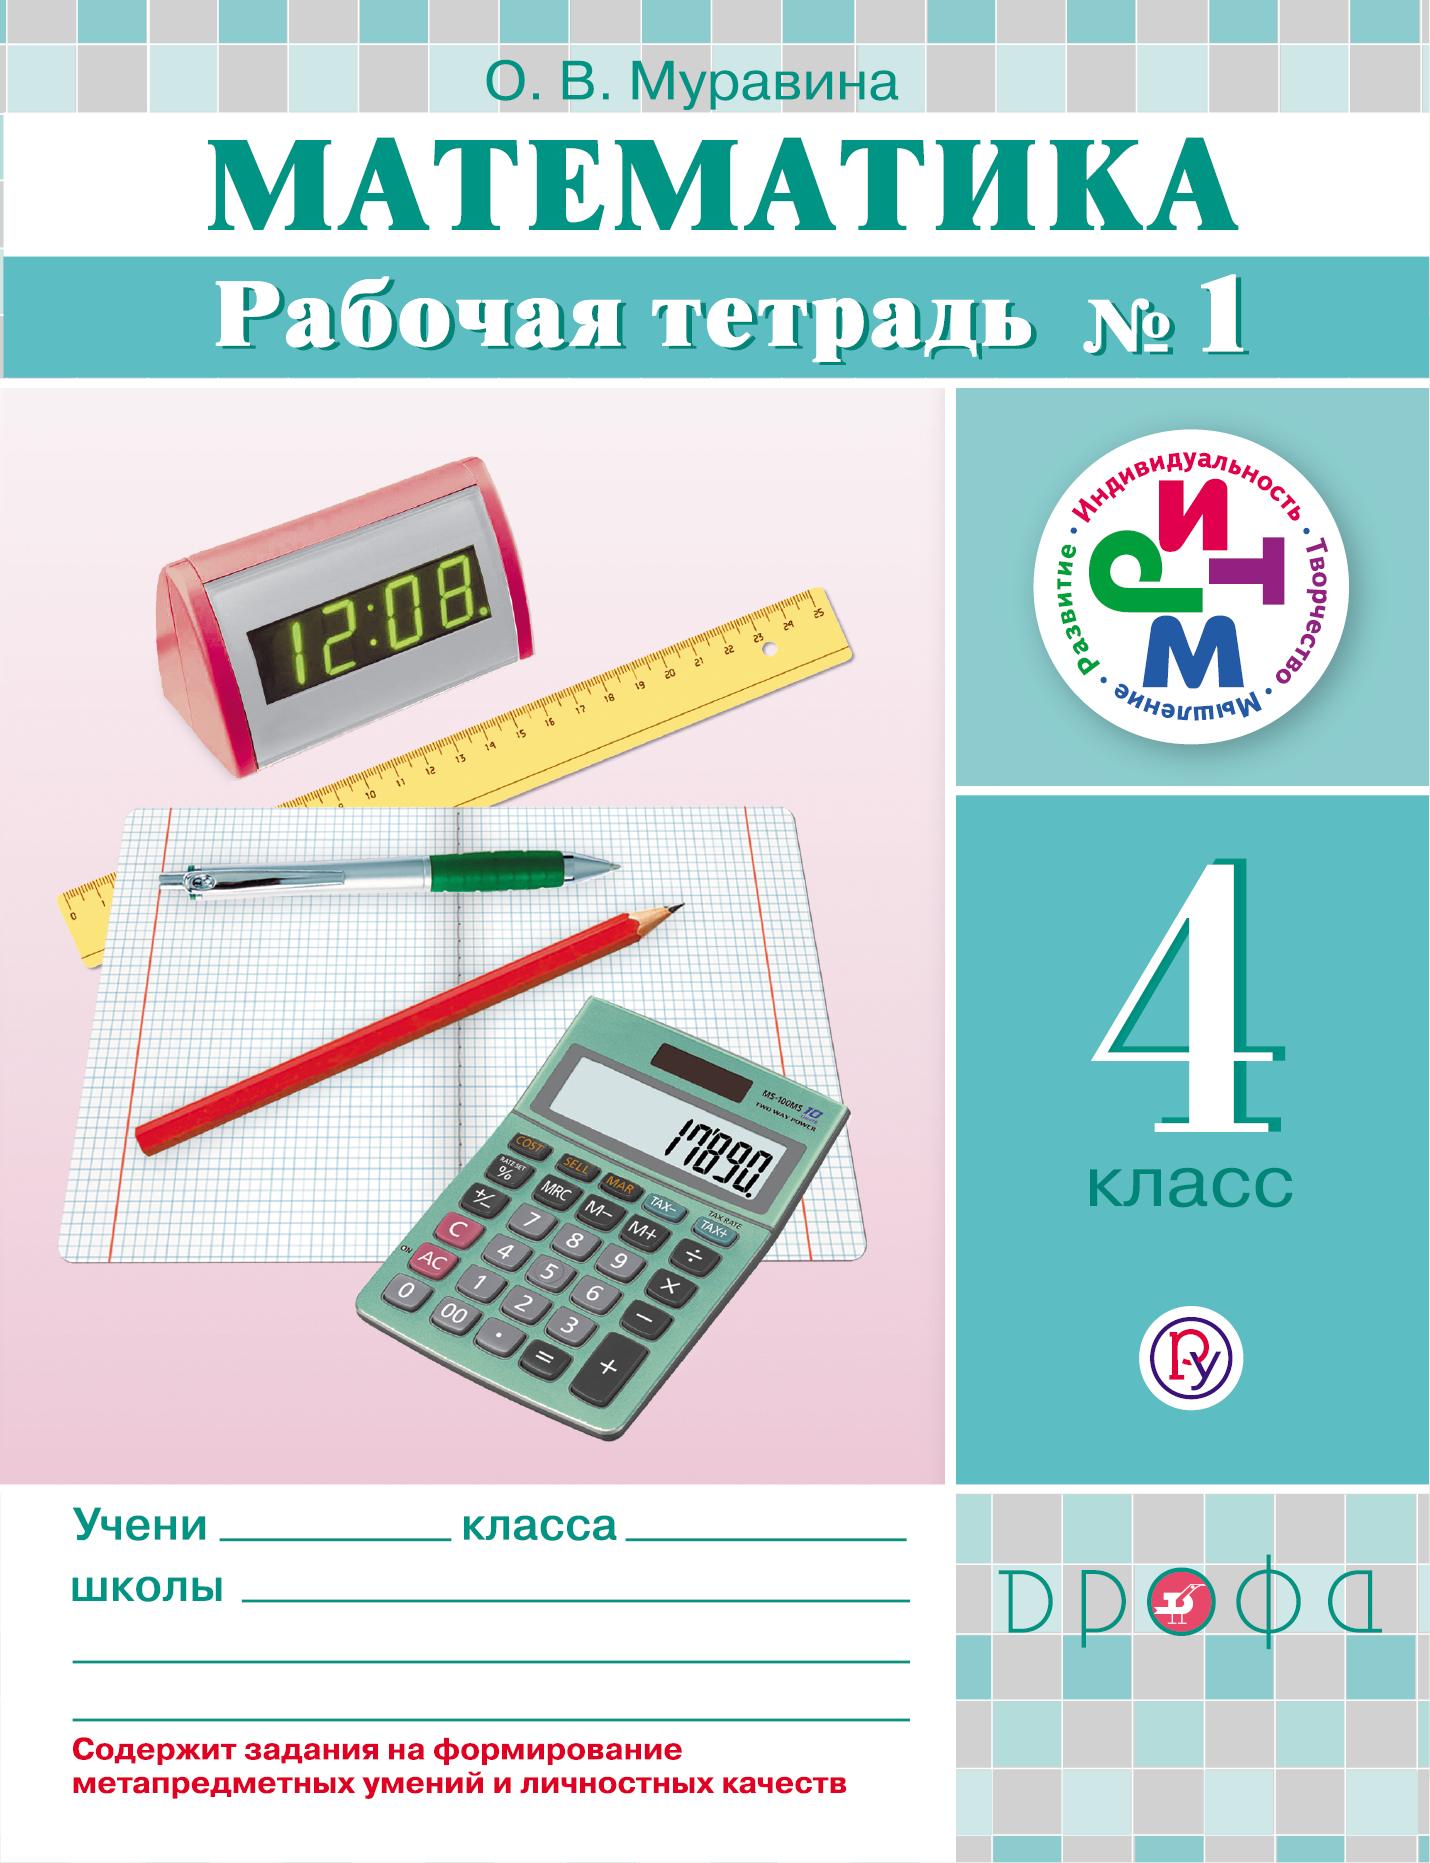 Муравина О.В. Математика. 4 класс. Рабочая тетрадь № 1